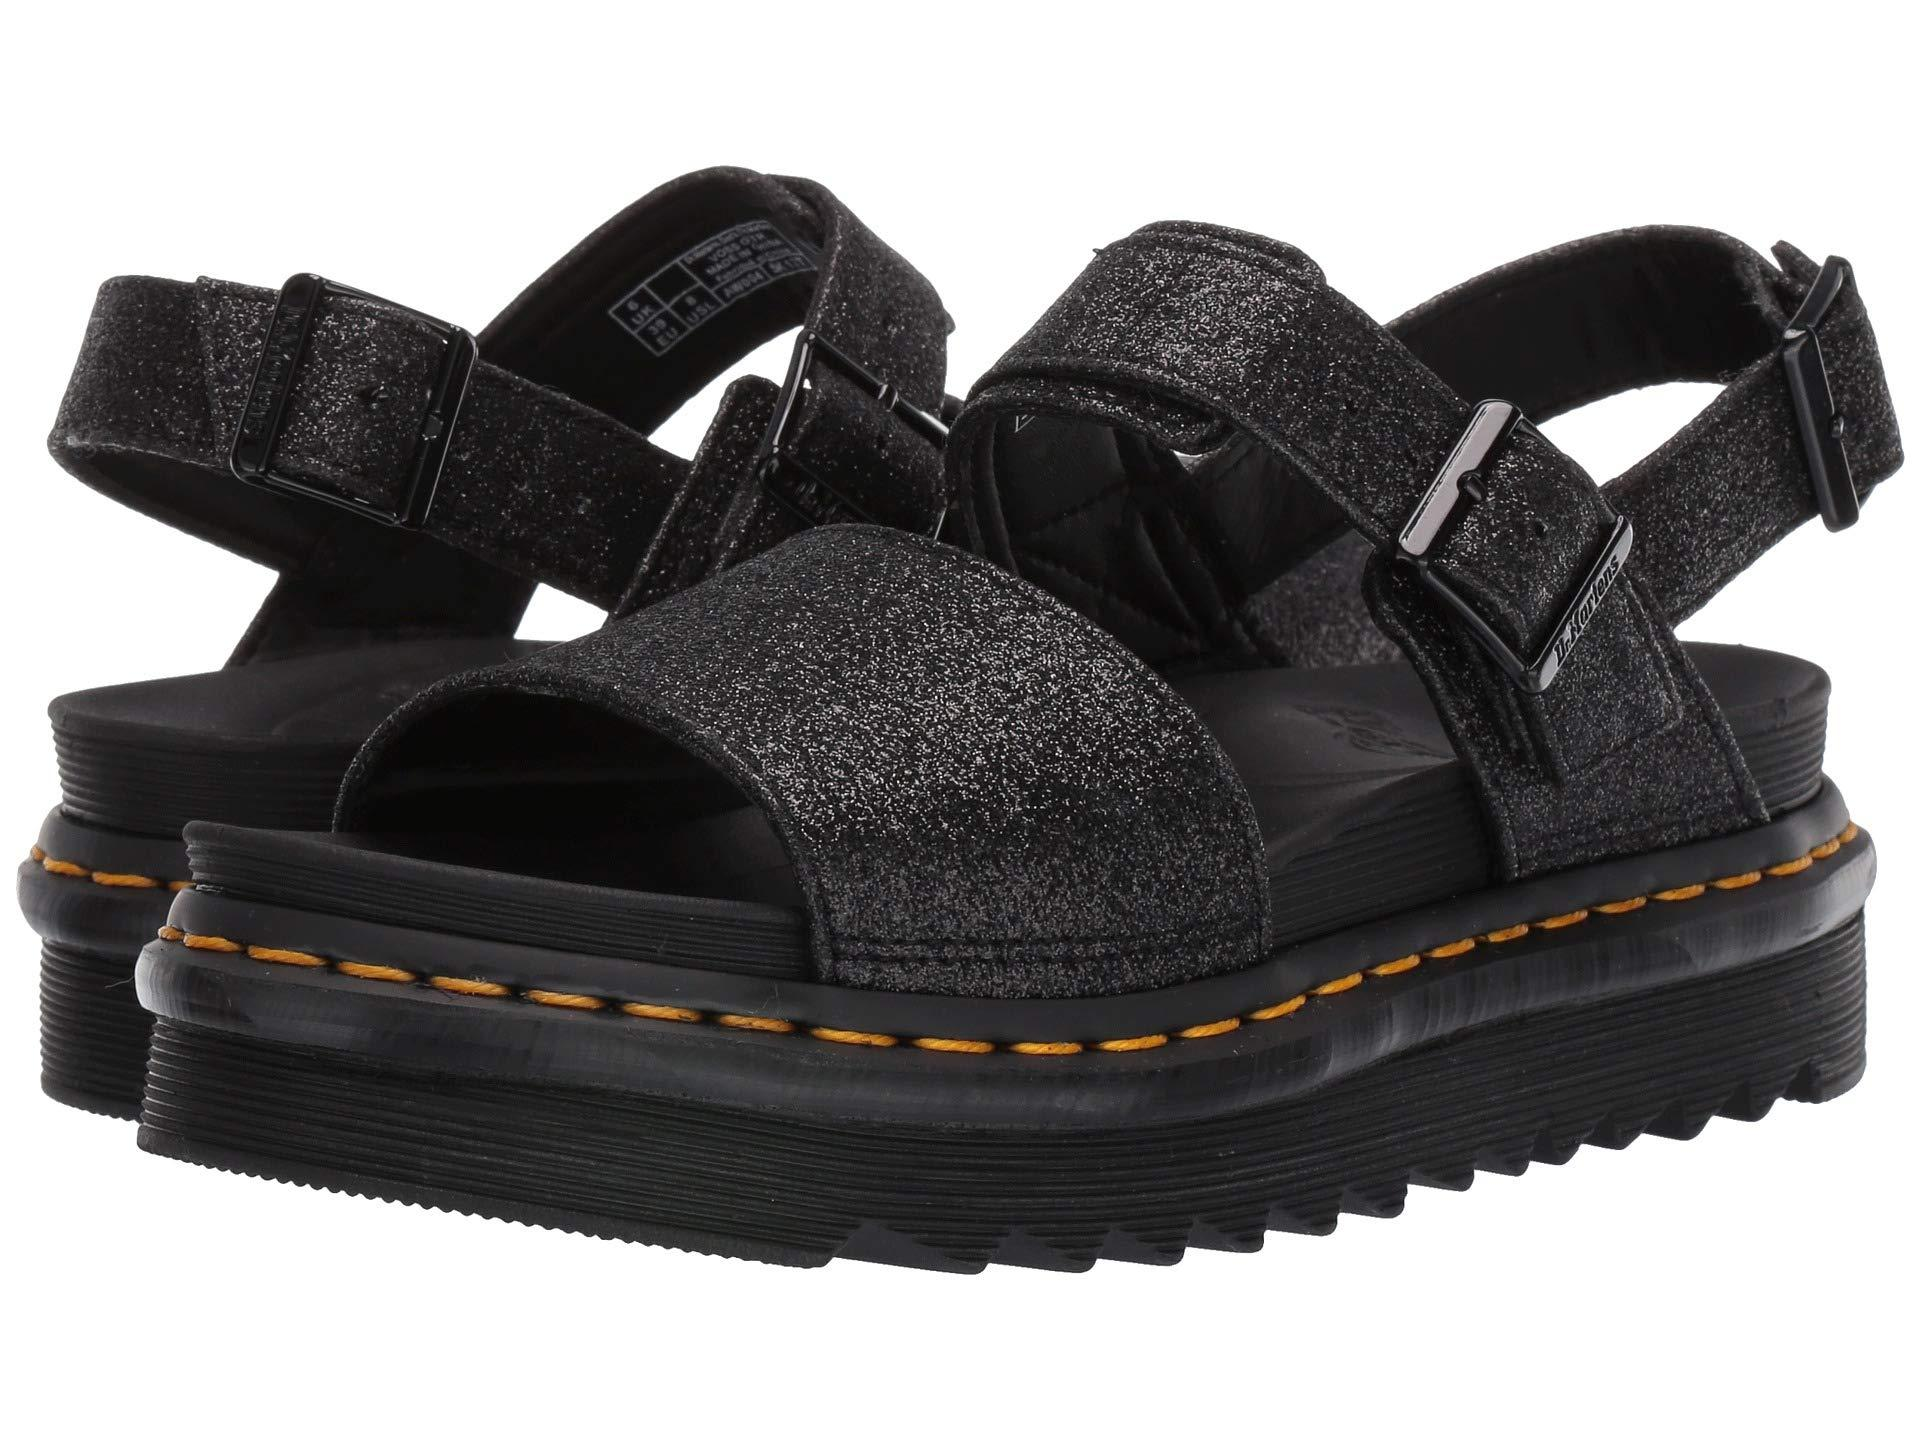 dr martens sandals glitter